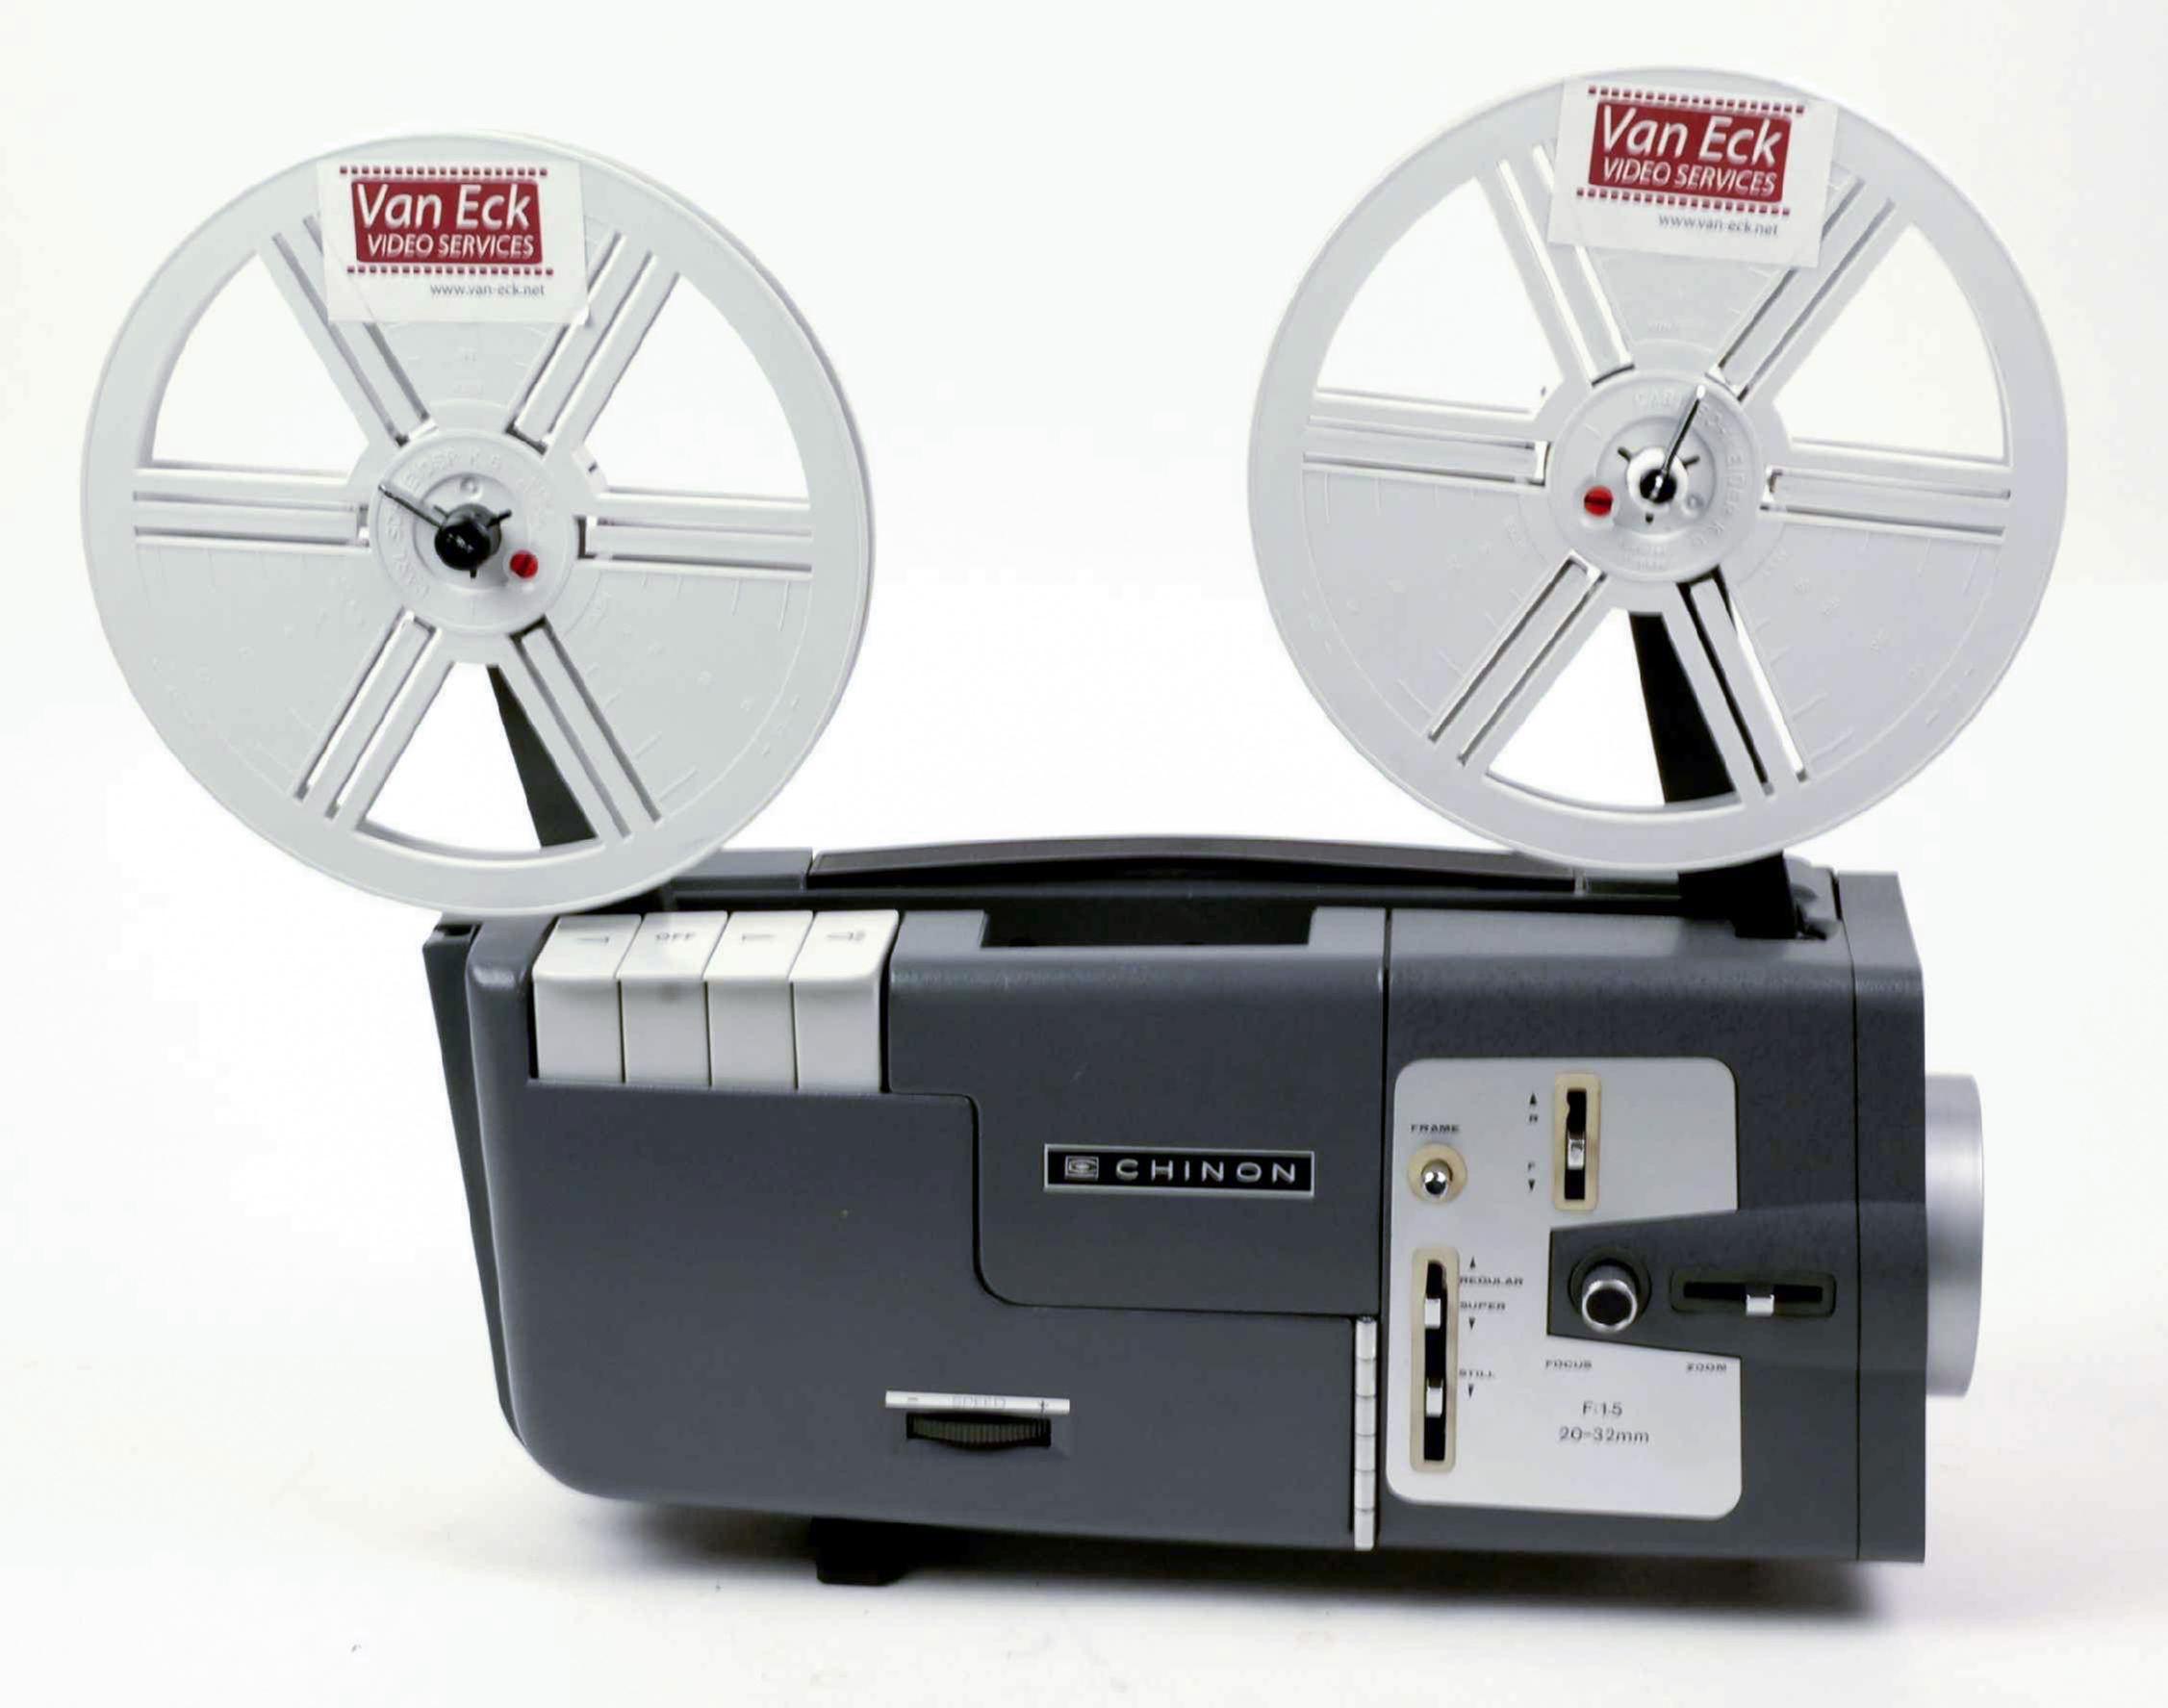 CHINON 5100 SUPER 8mm SOUND CINE FILM PROJECTOR MOTOR DRIVE BELT